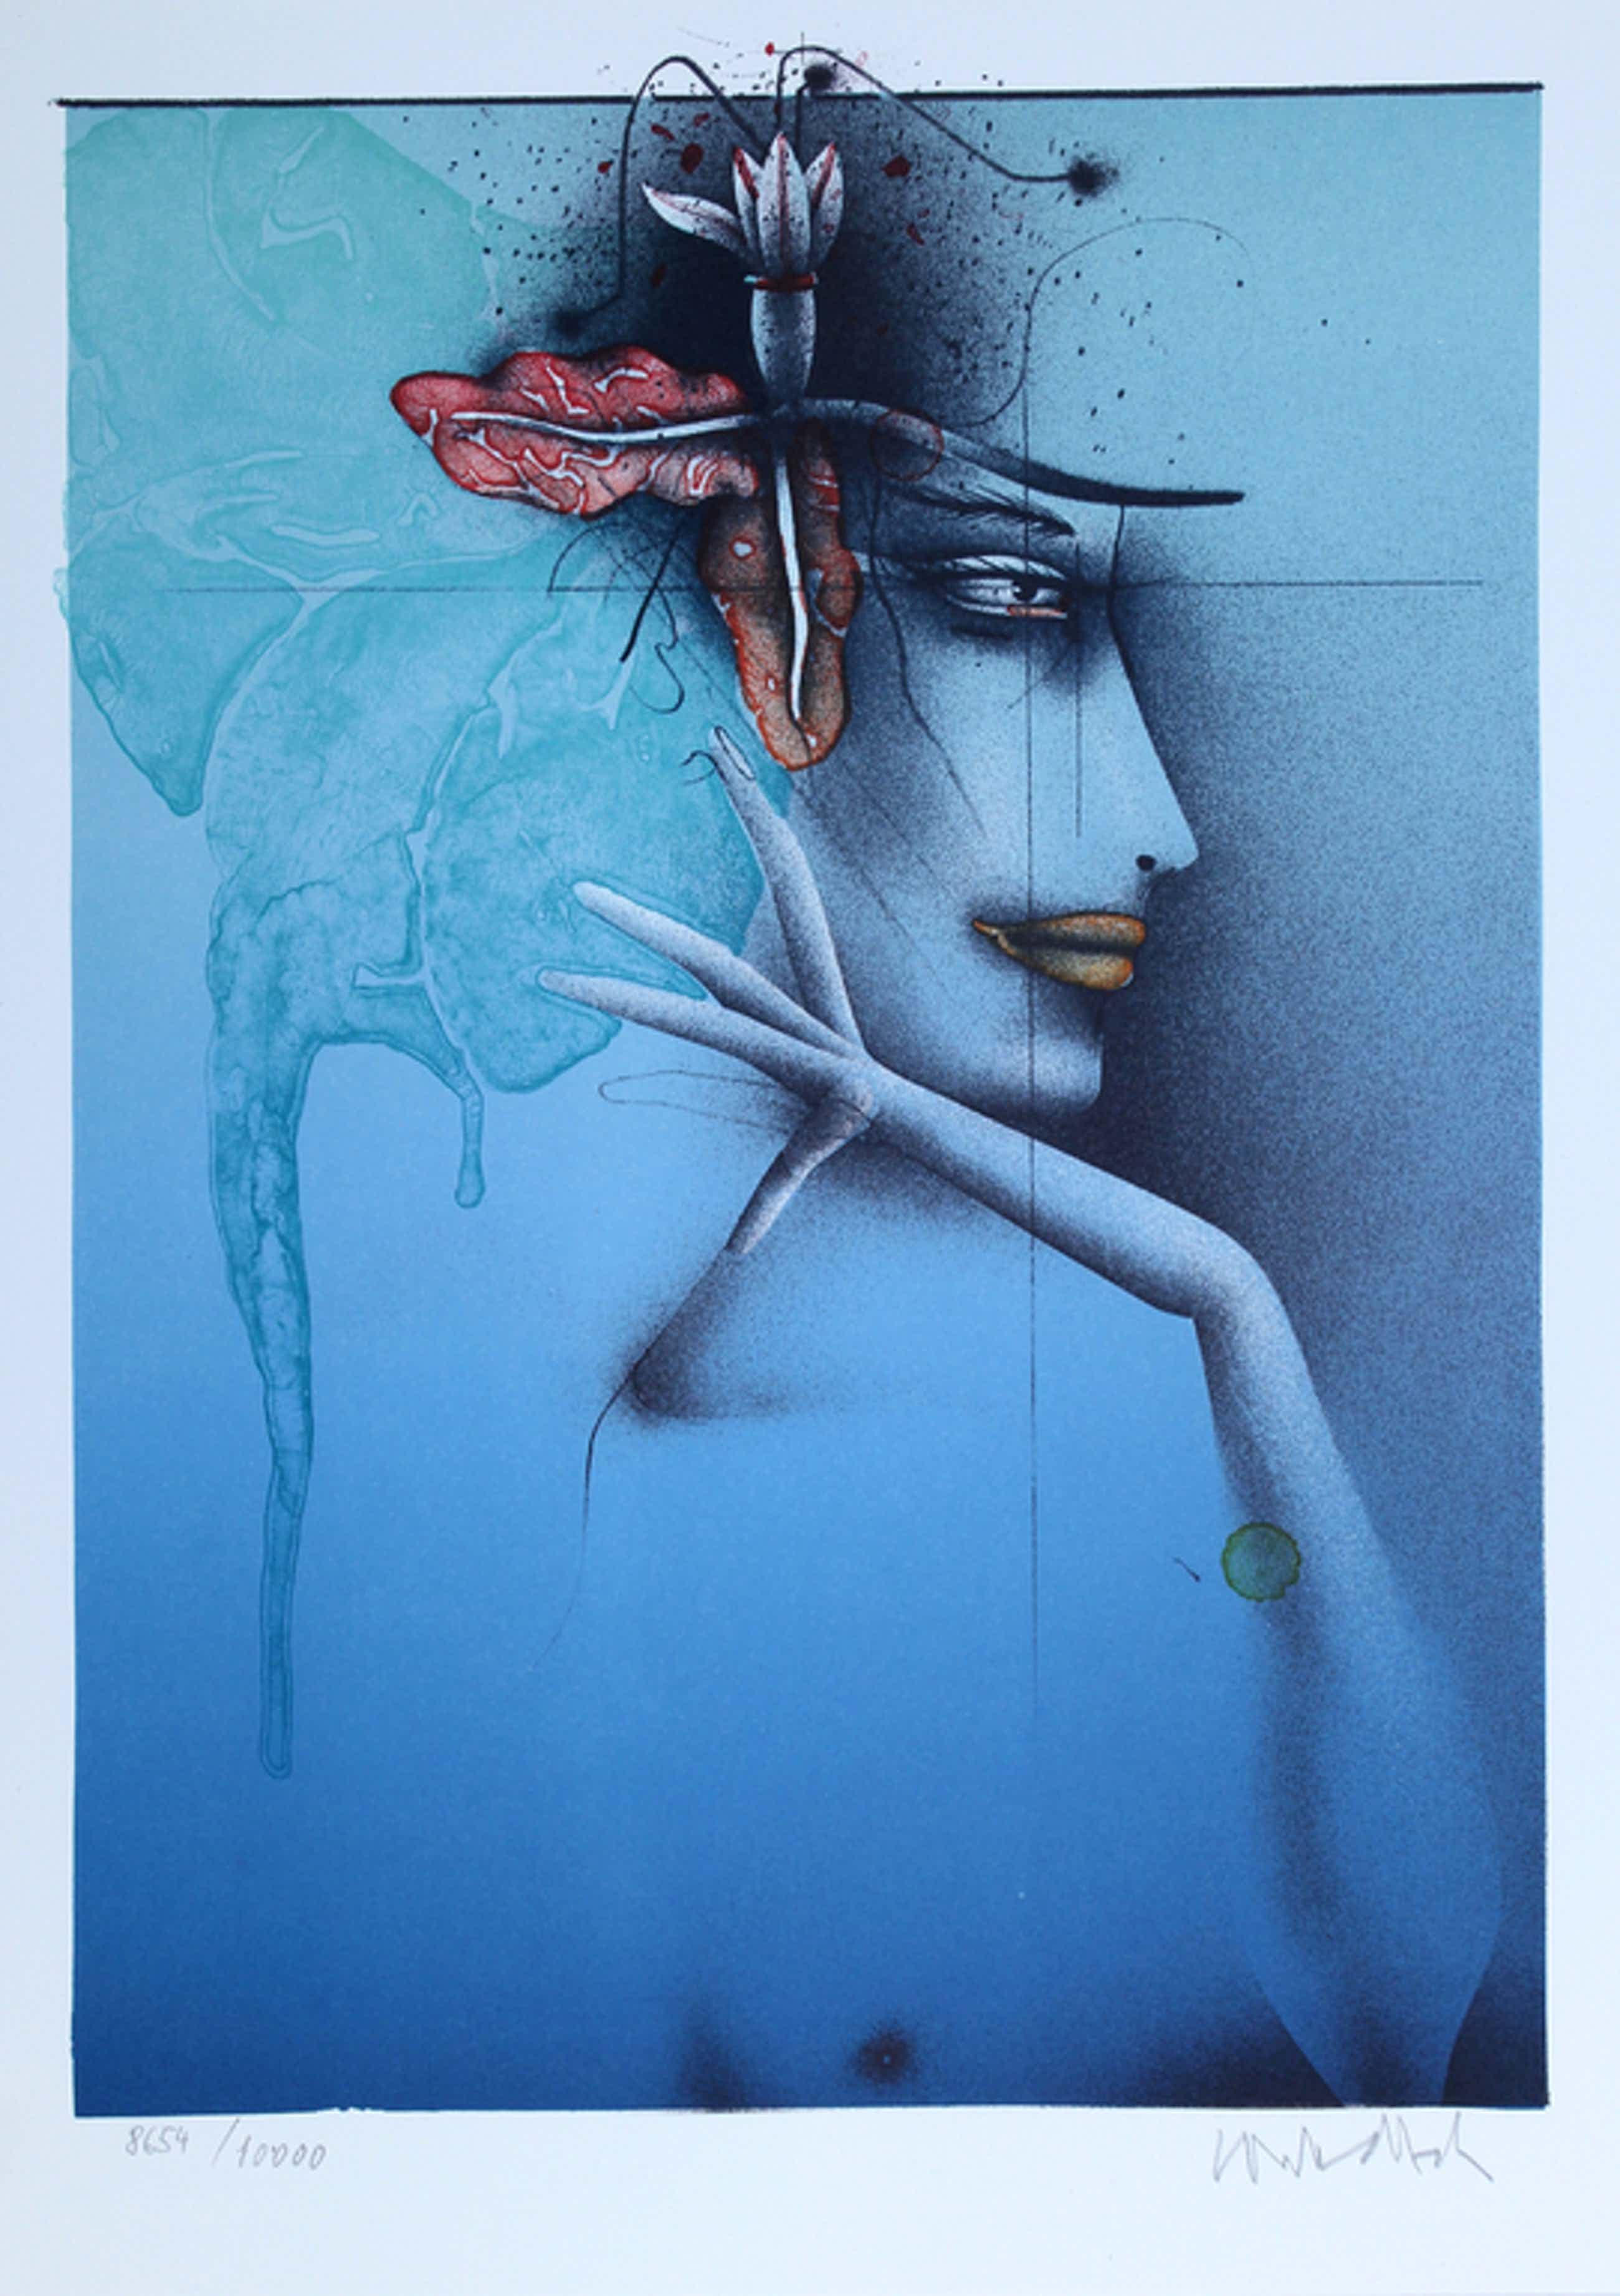 Paul Wunderlich - Handgesigneerde lithografie, Tête d'une Femme (Bleu) kopen? Bied vanaf 75!